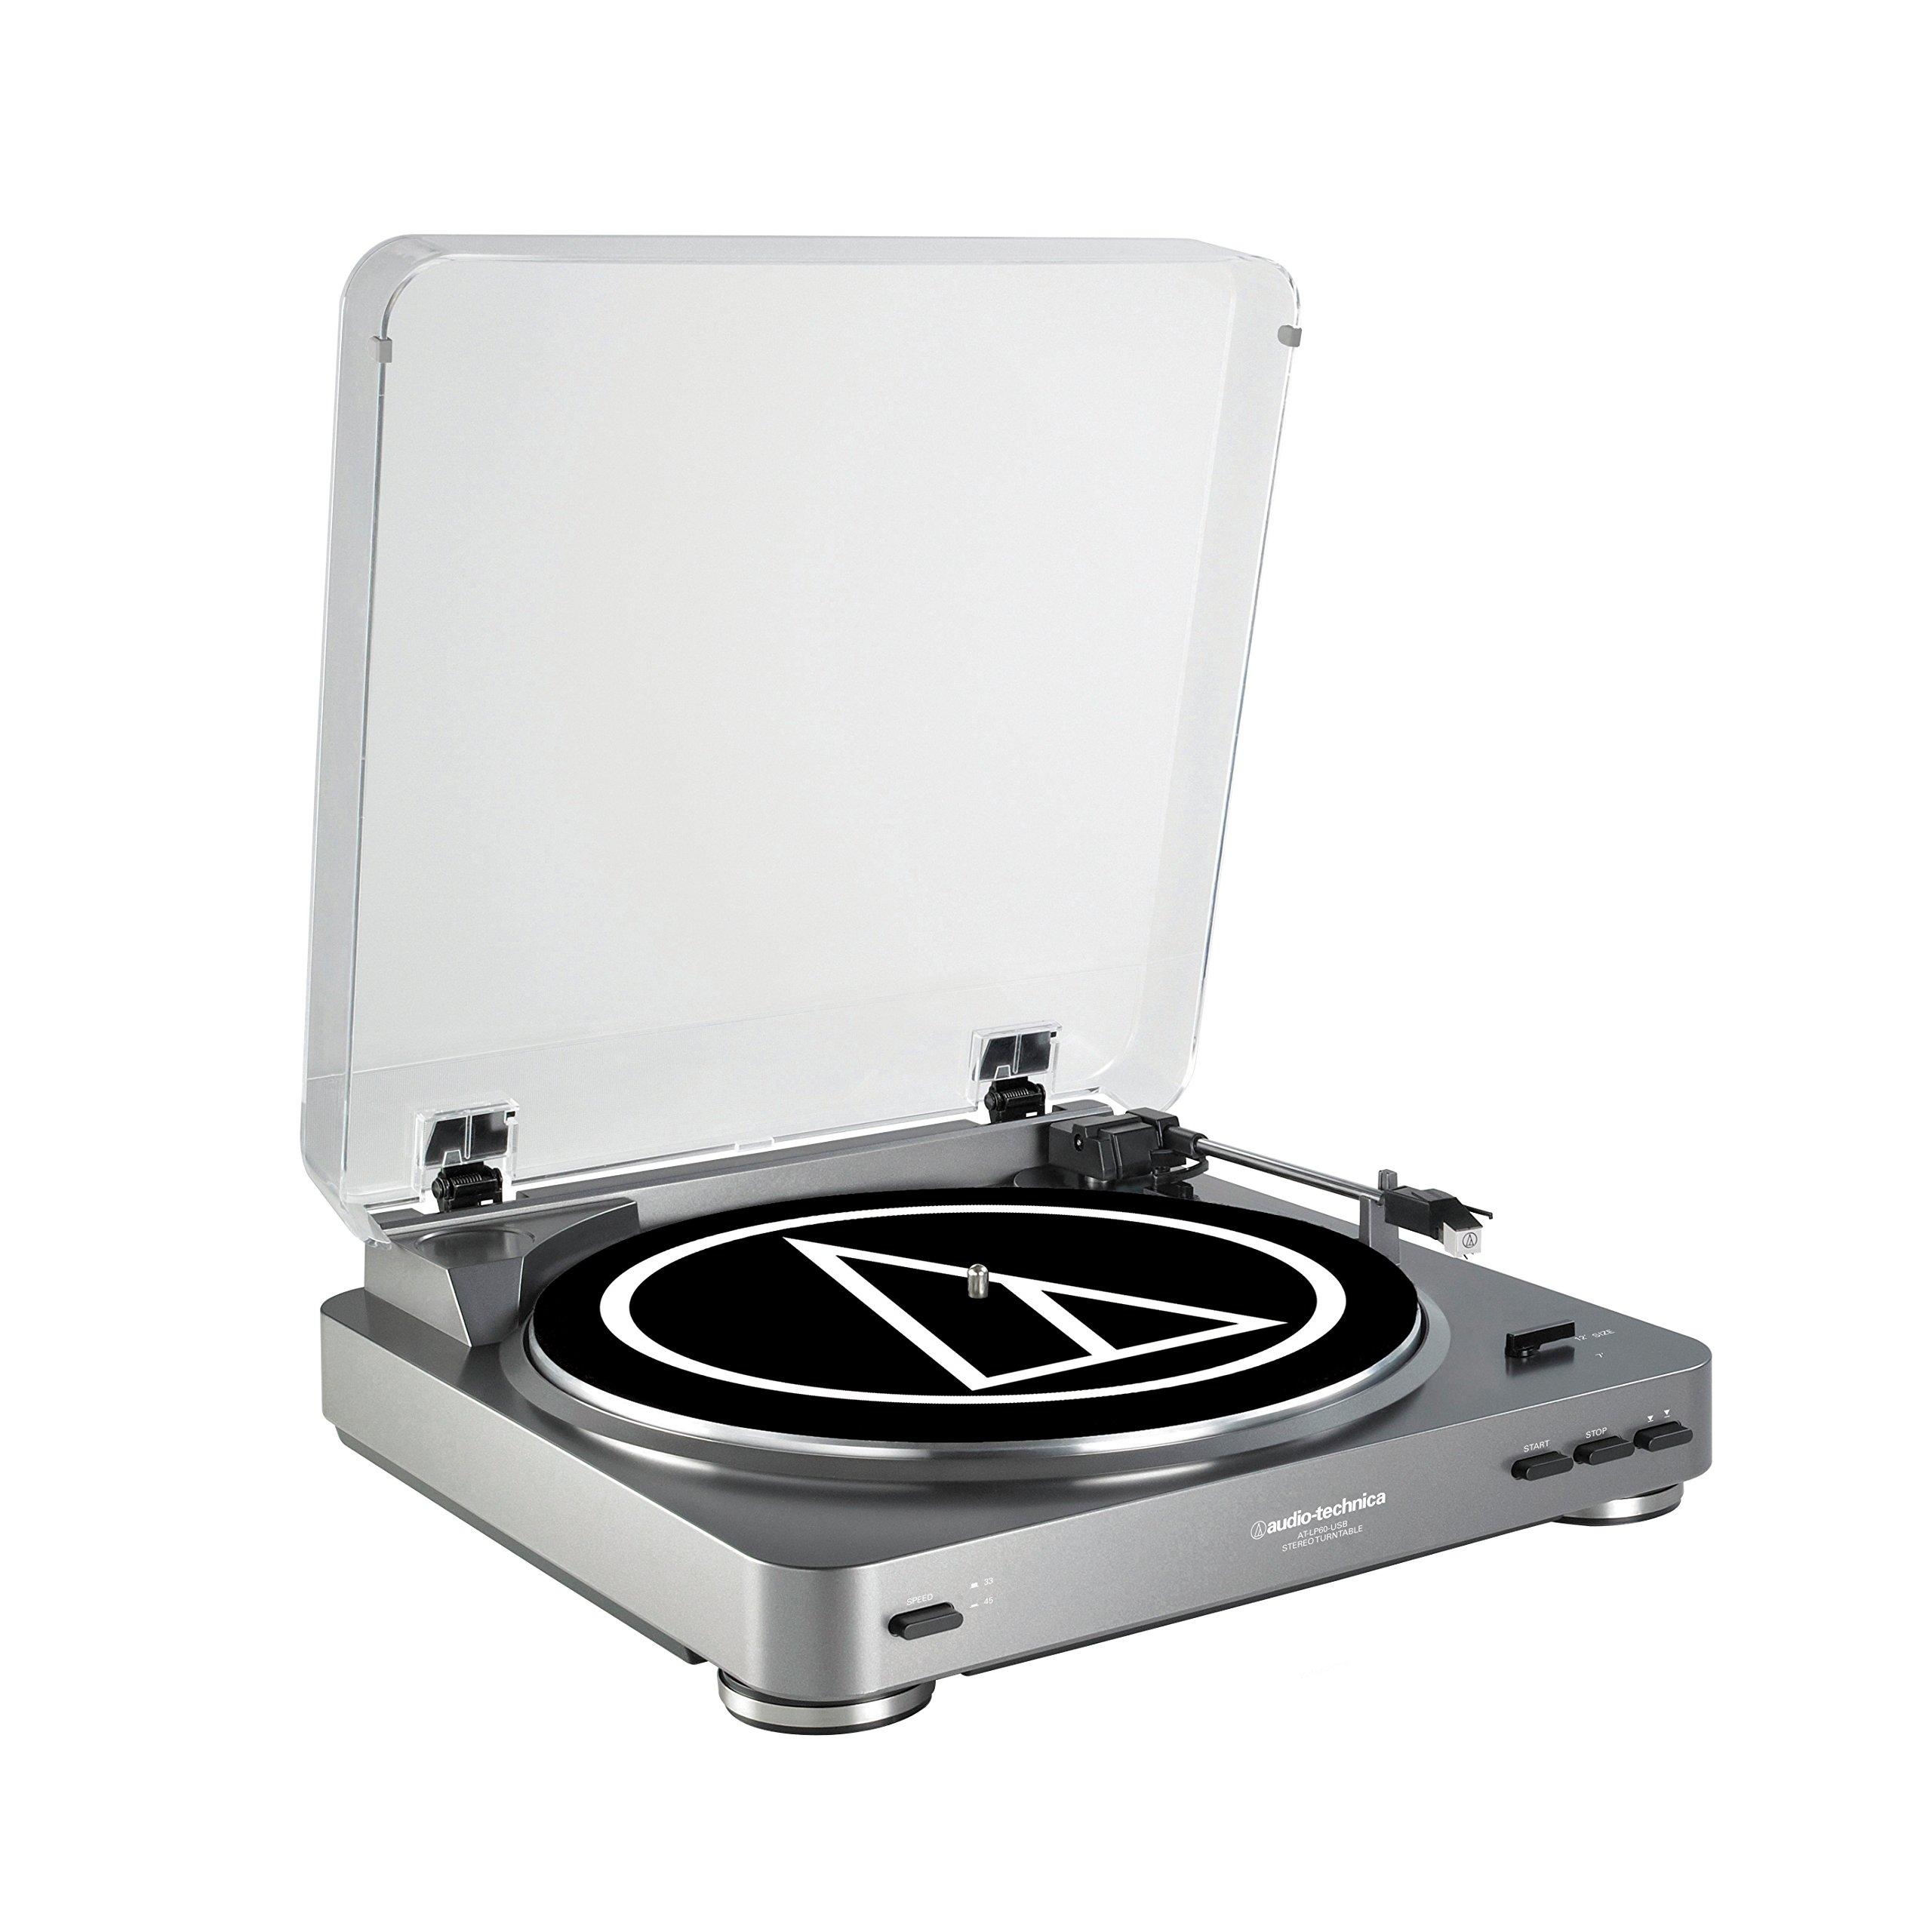 Audio-Technica ATLP60USB LP to USB Digital Belt Drive Turntable - (Silver) by Audio-Technica